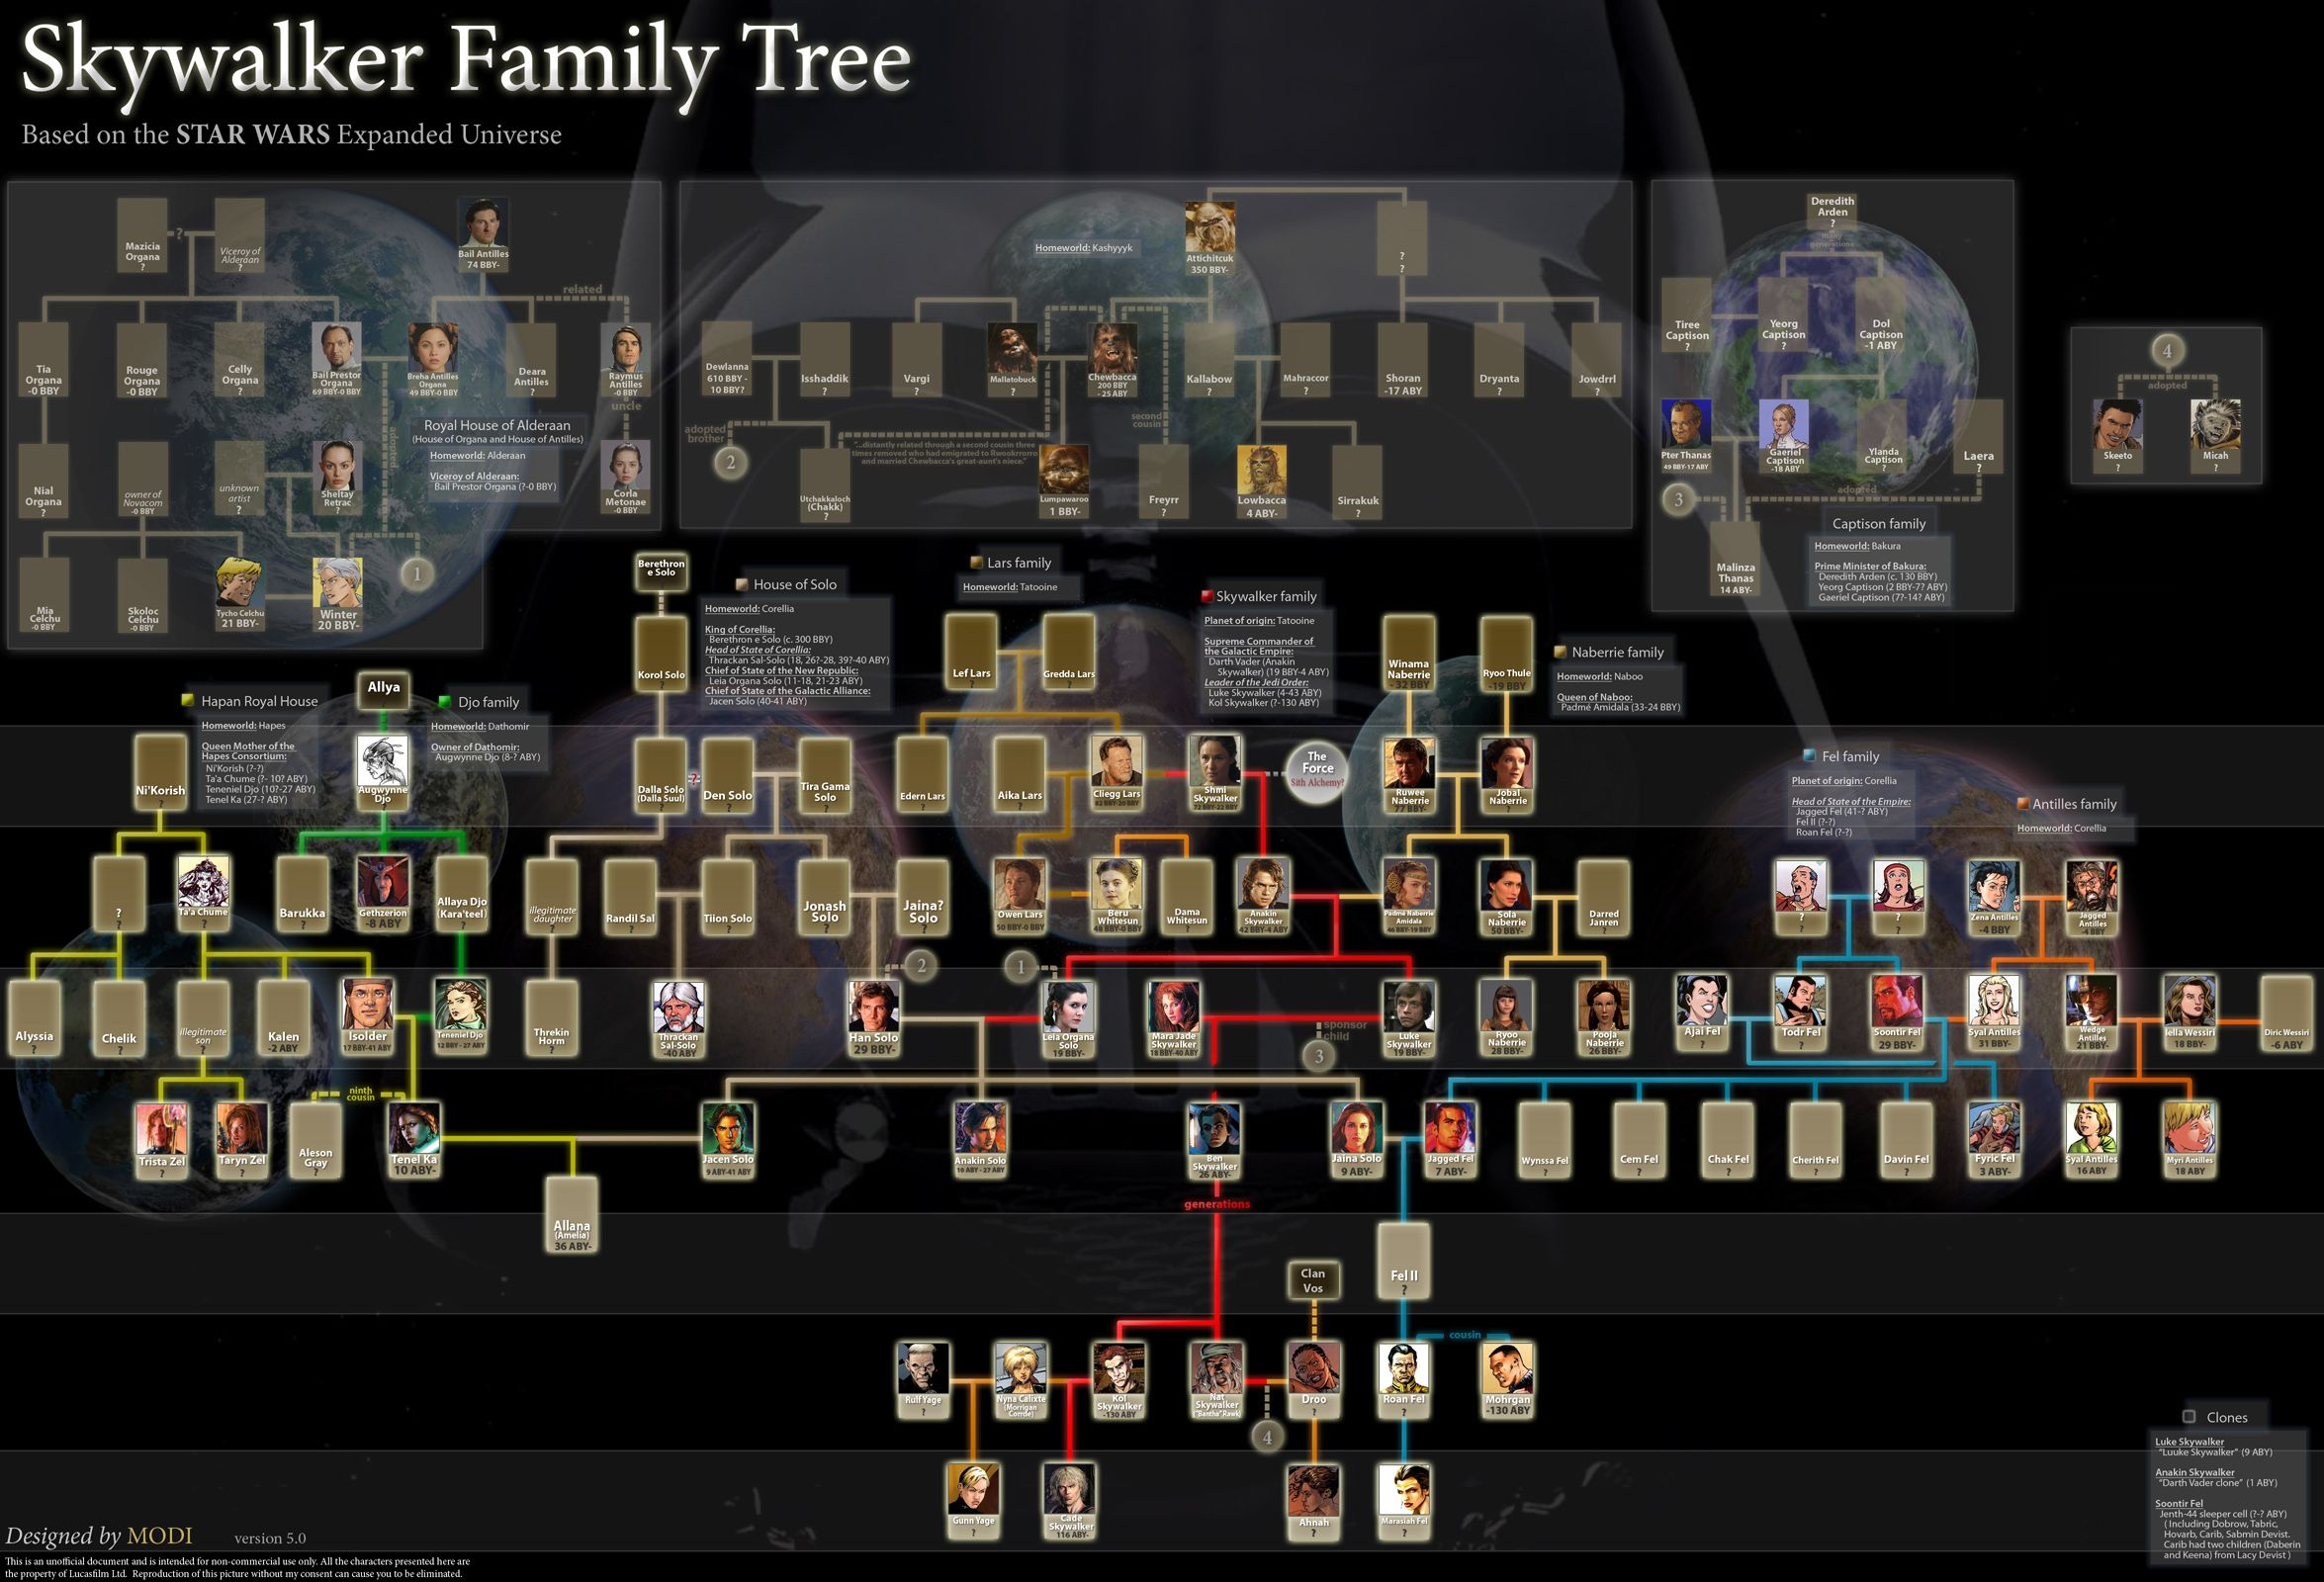 Skywalker family tree cosas pinterest cosas for Arbol genealogico star wars